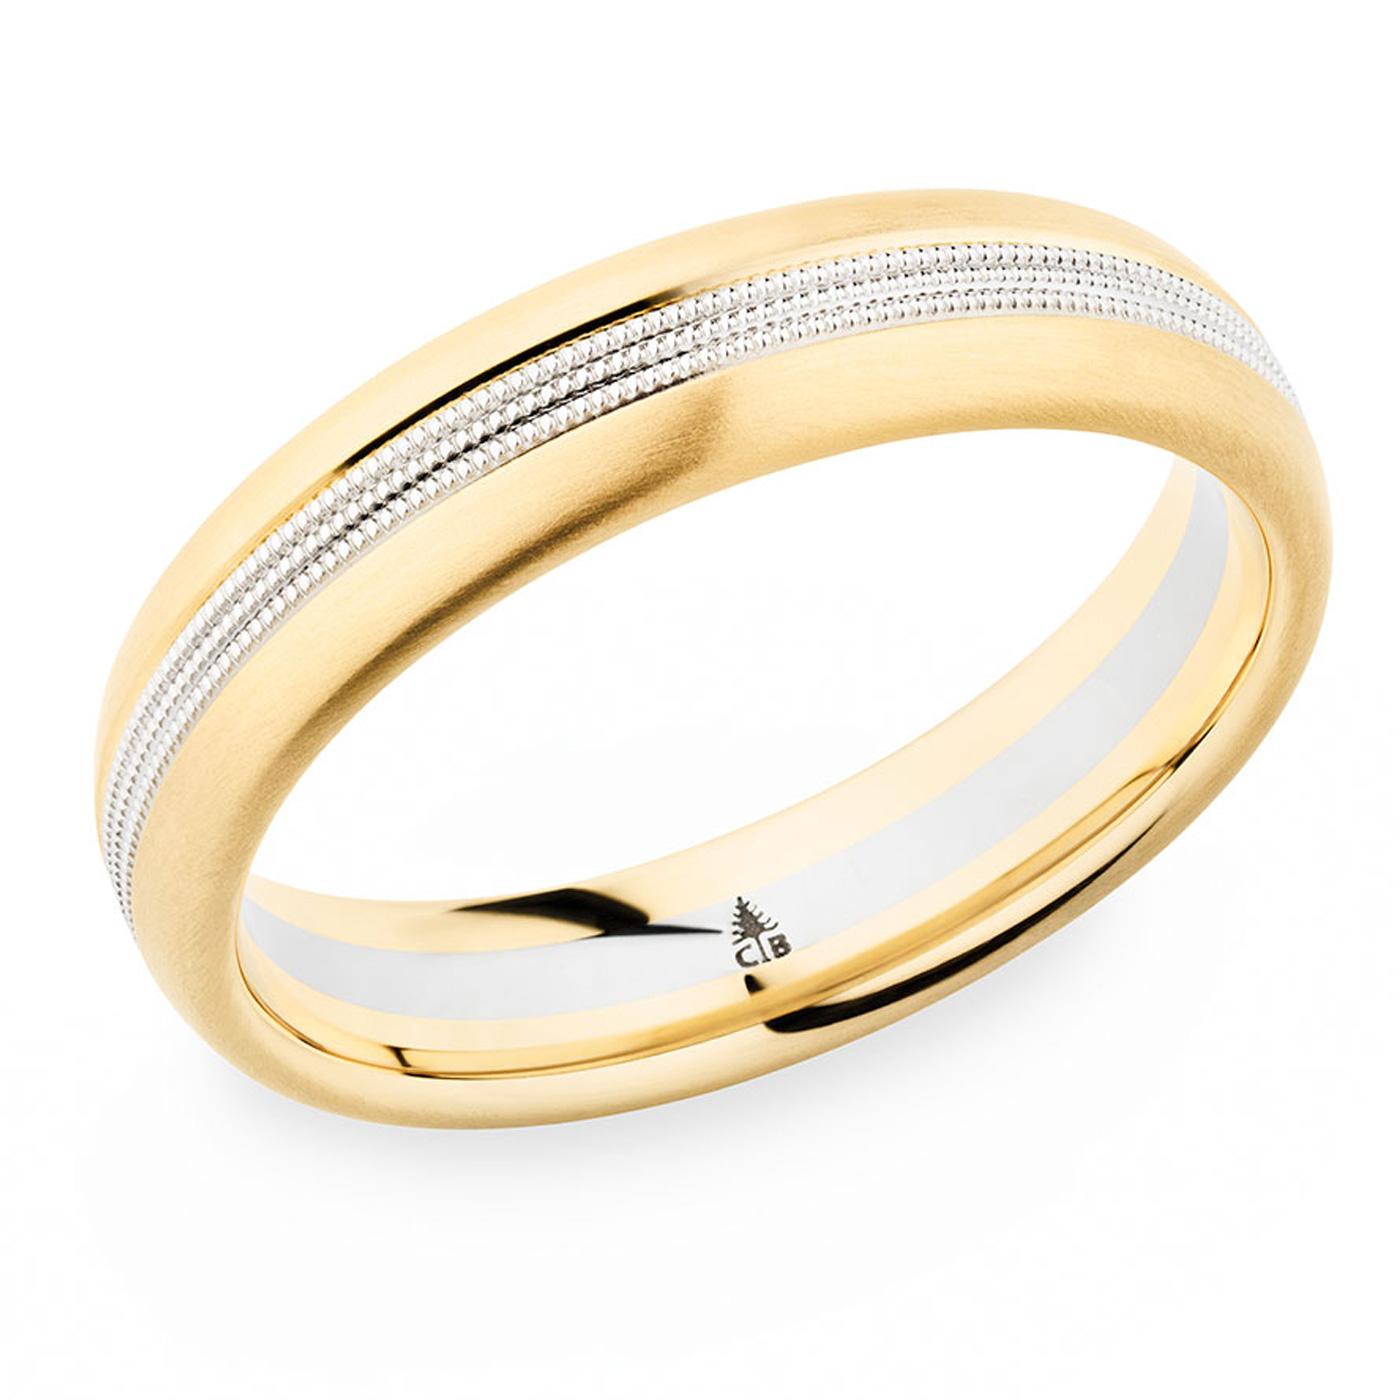 274420 Bauer Palladium 18 Karat Wedding Ring